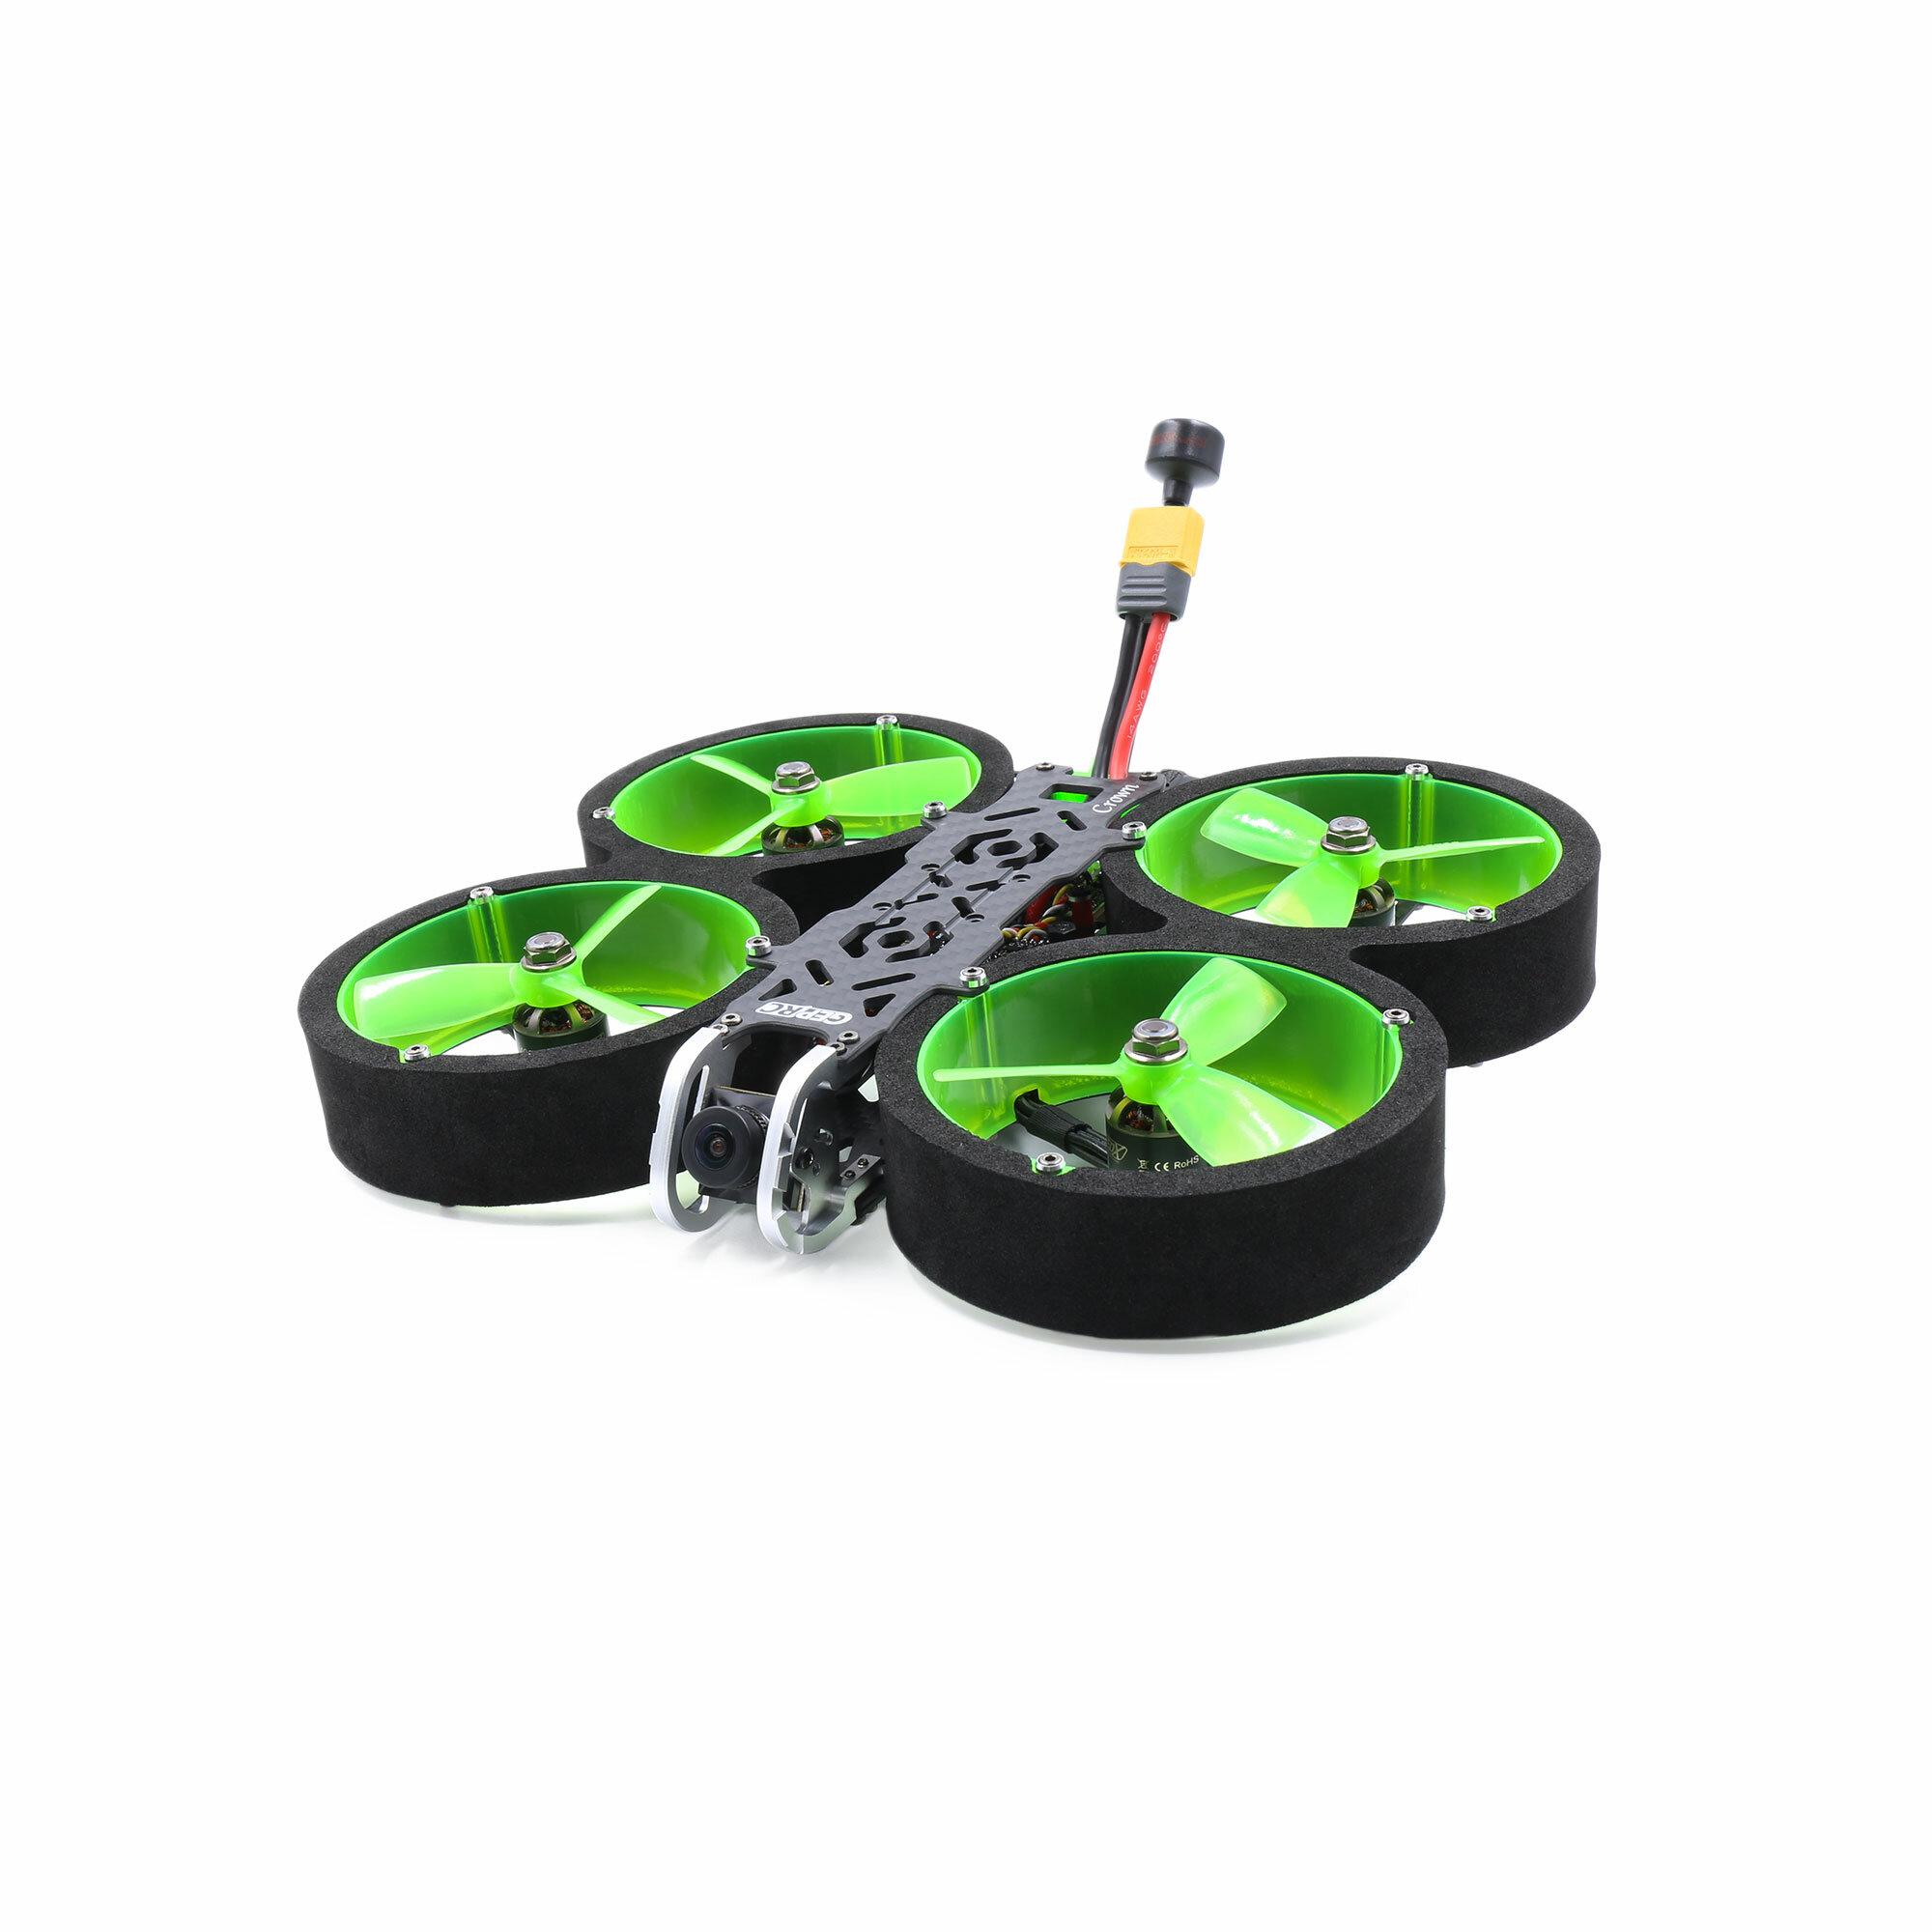 GEPRC Crown Analog 3 Inch 4S Cinewhoop FPV Racing Drone PNP/BNF Caddx Ratel V2 Cam 600mW VTX SPAN F722 HD FC 1408 3500KV Motor 45A Blheli_S ESC